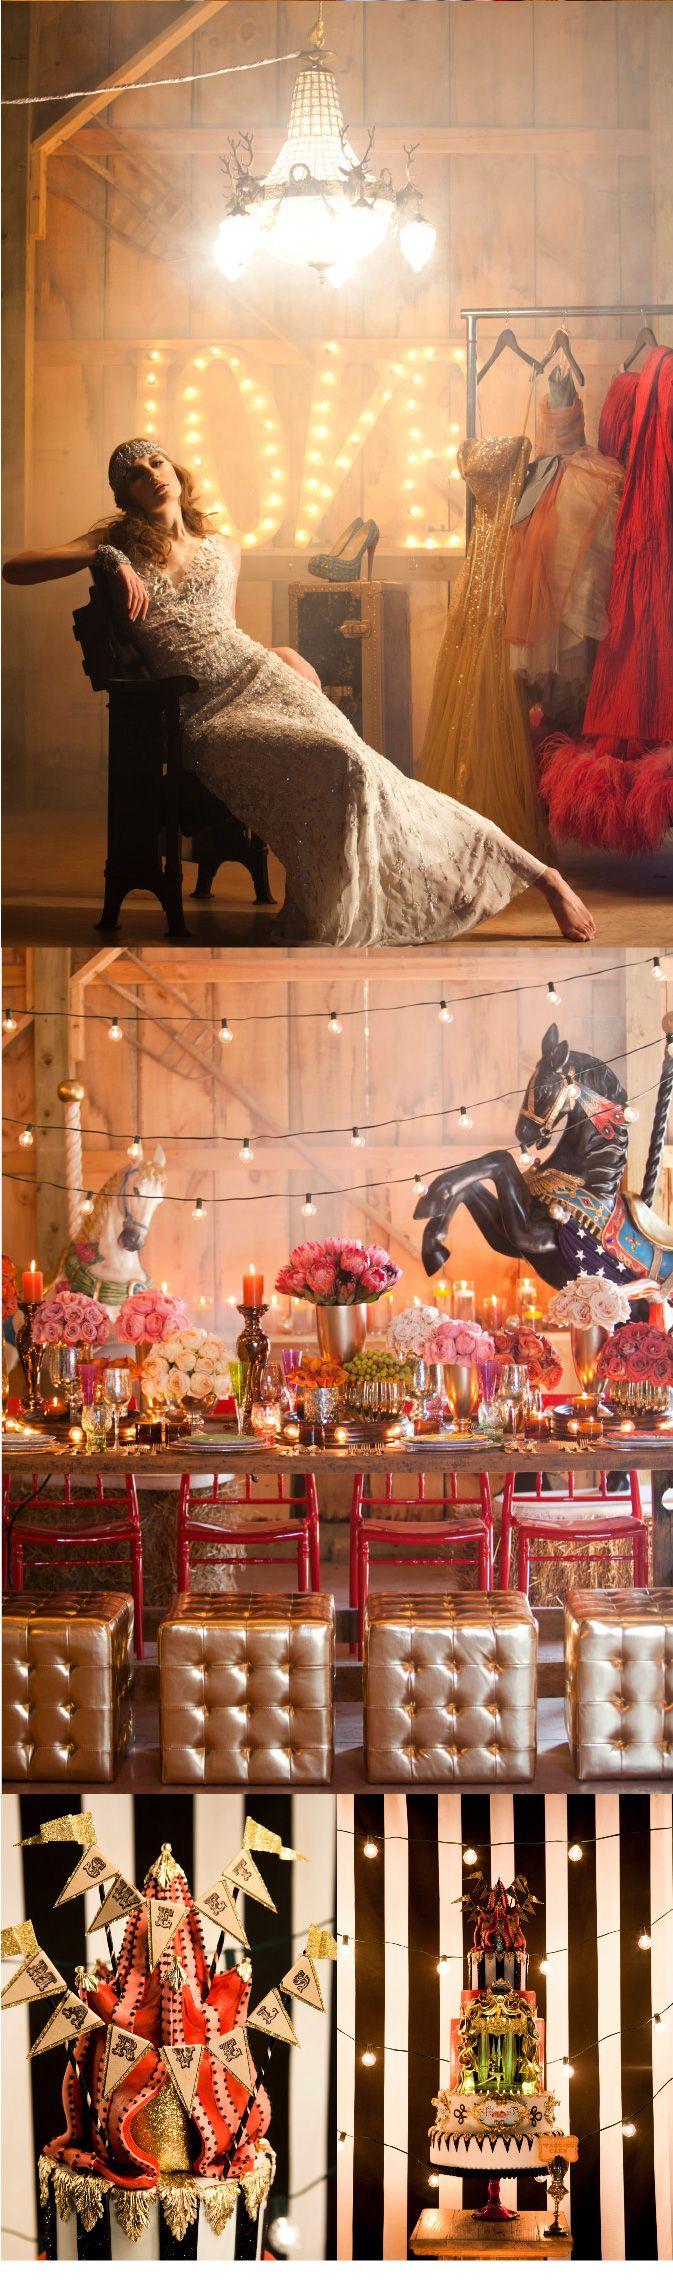 liebelein-will, Hochzeitsblog, Blog, Hochzeit, Kirmes: Circus Themed Wedding Inspiration.